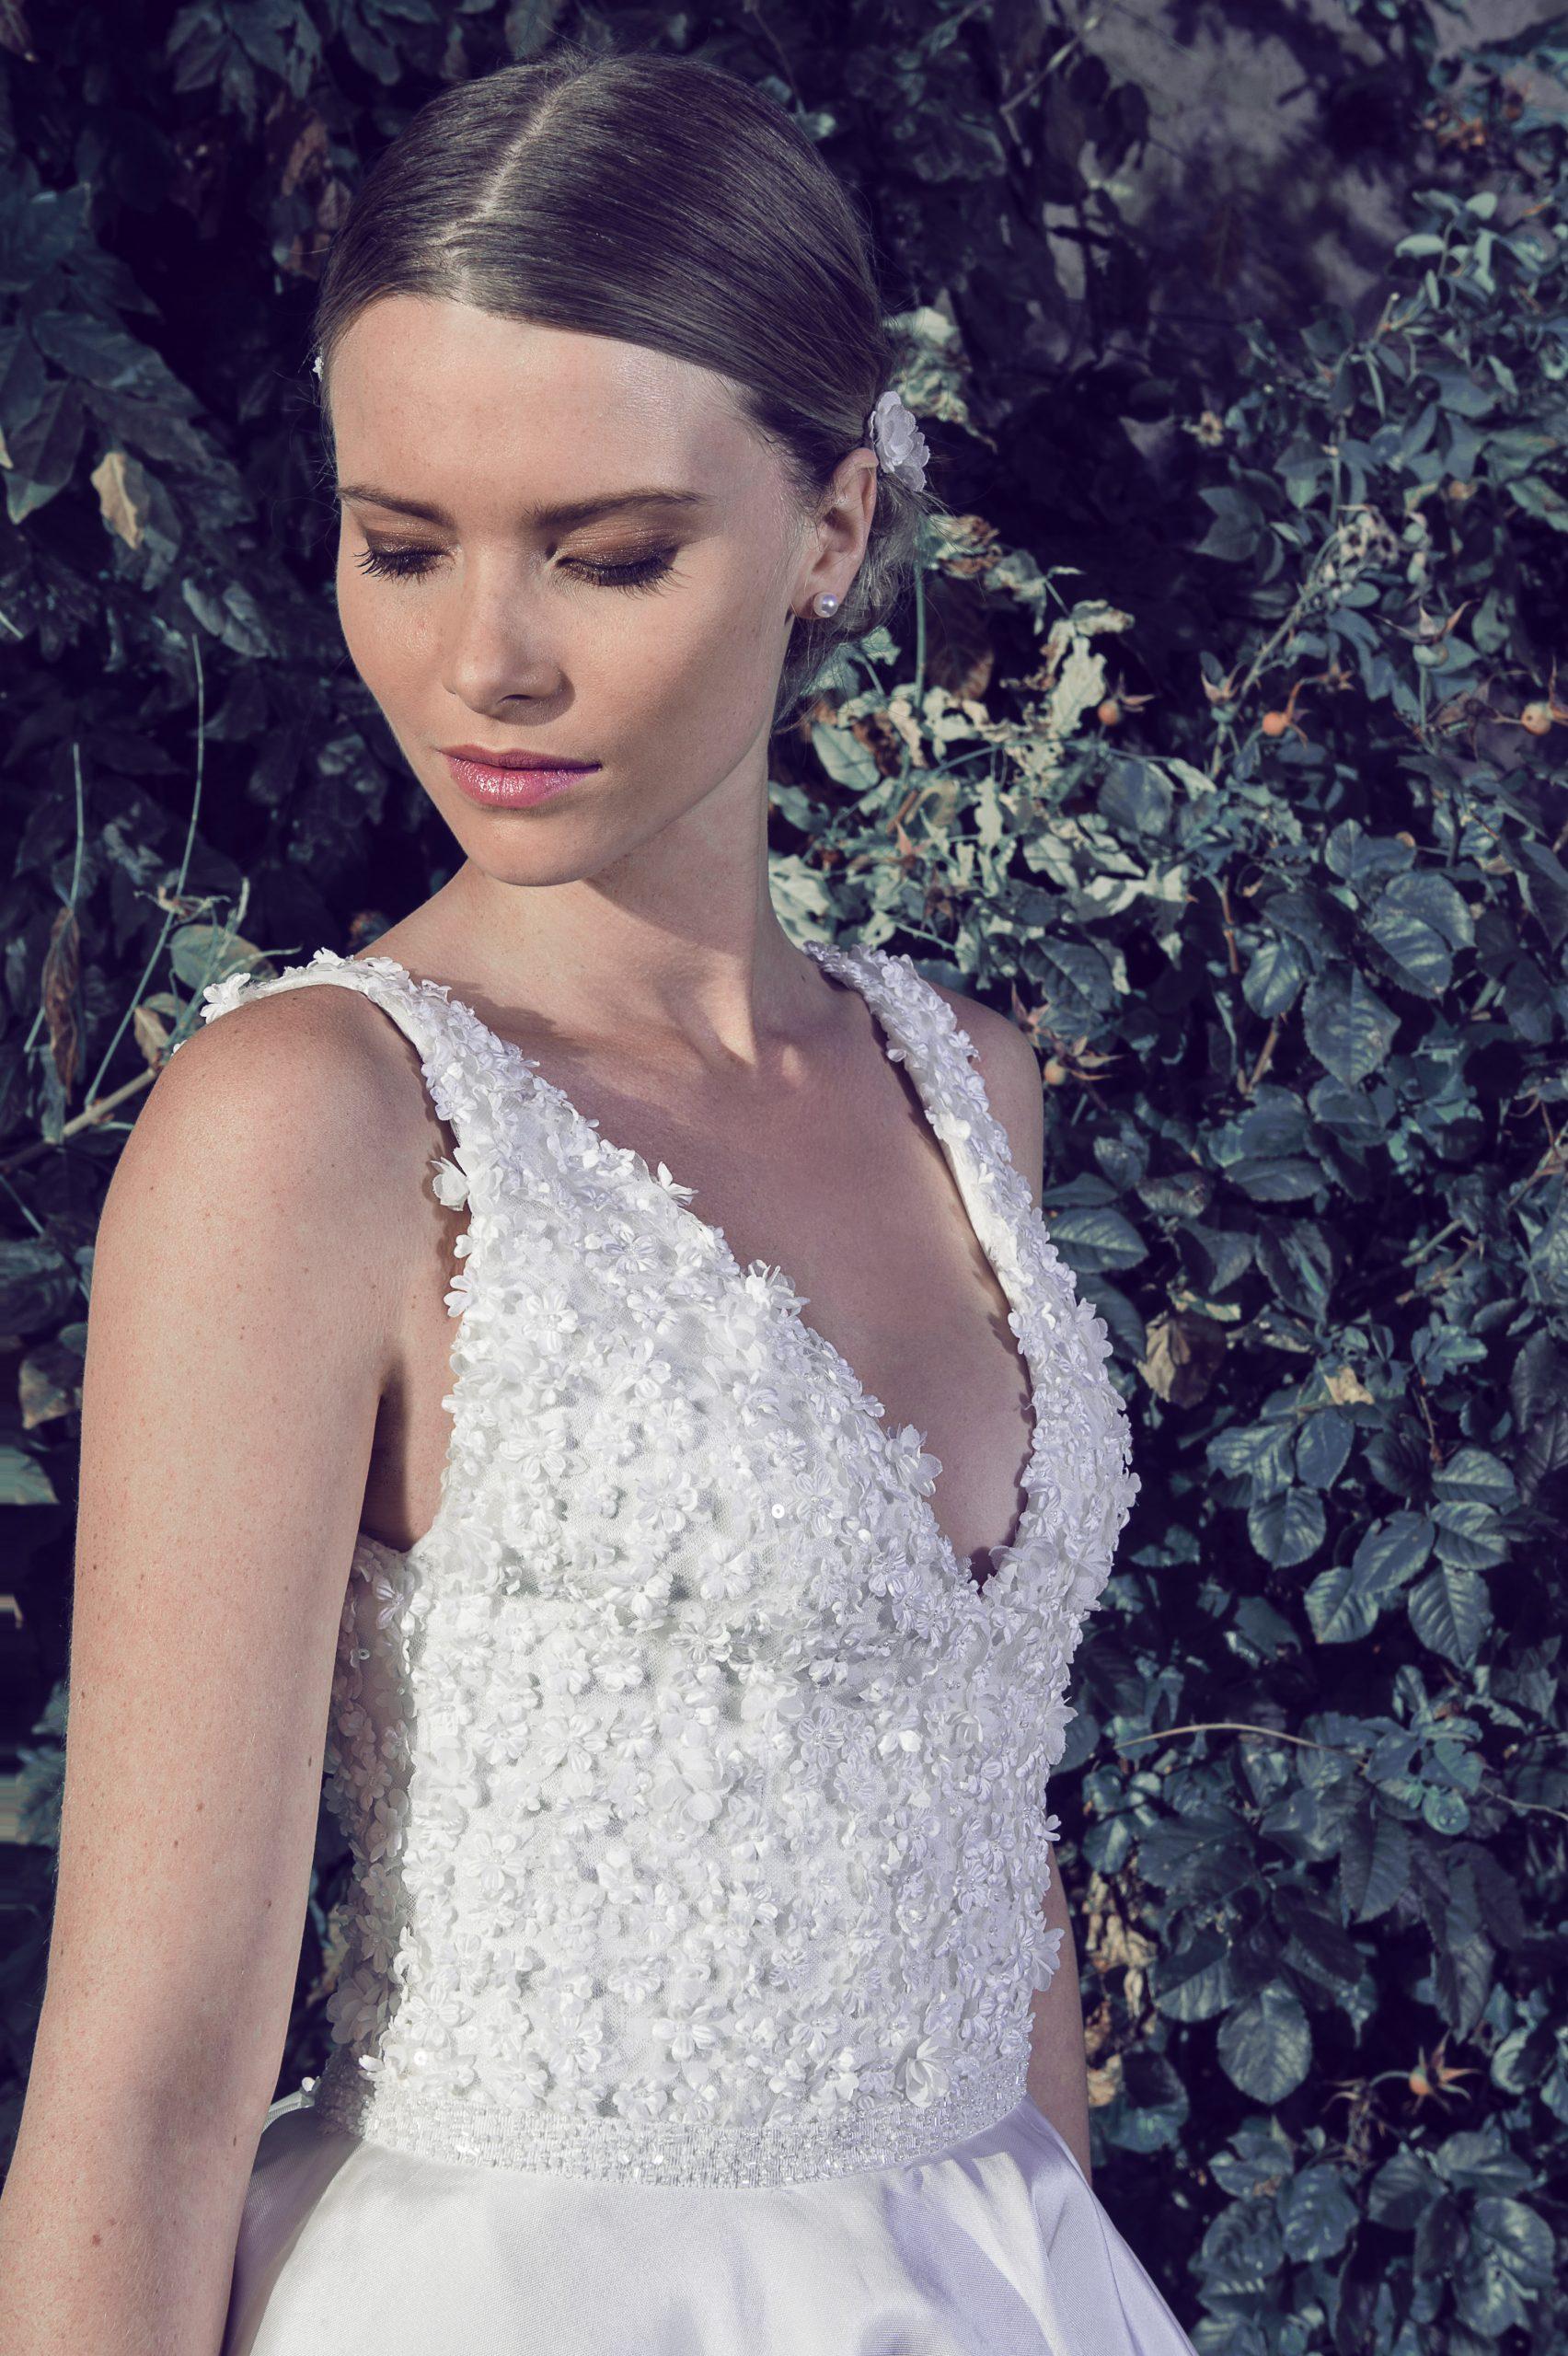 seance photo-mariage-robe mariée-créateur-nicolas fafiotte-maquillage-dmkf-4